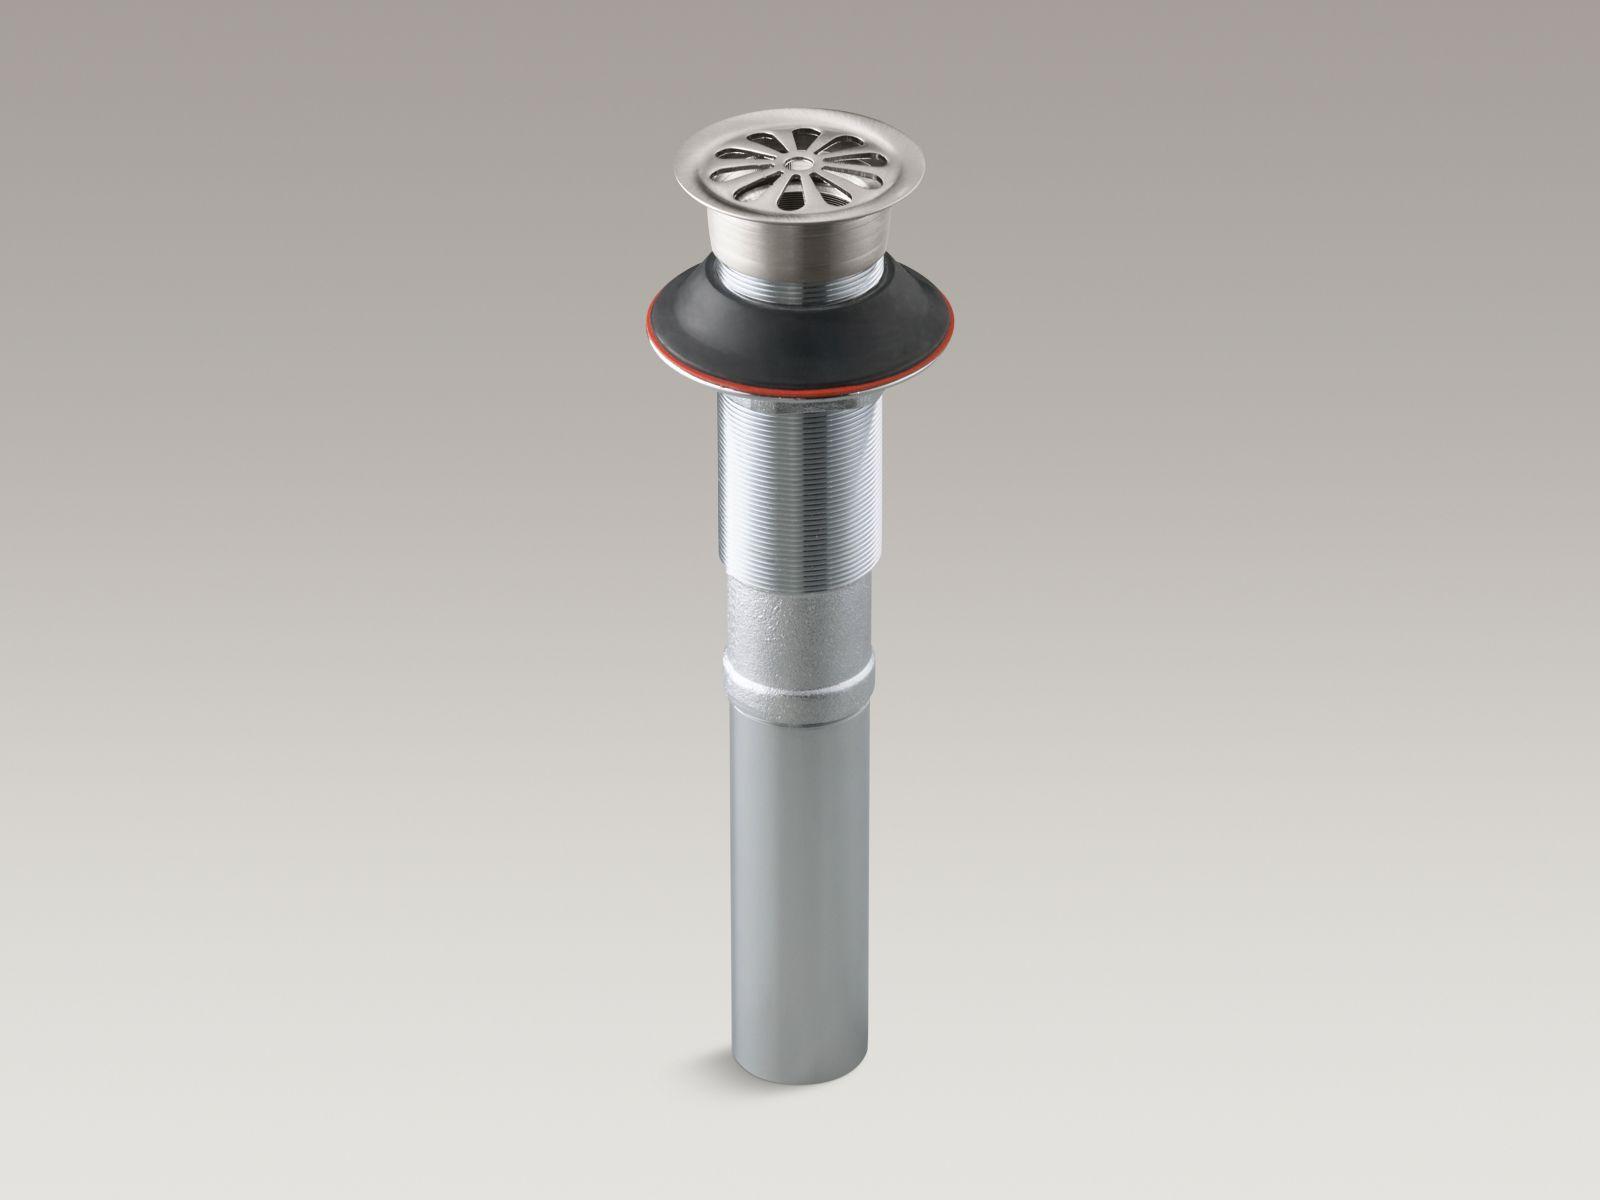 Kohler K-7129-VS Bathroom Sink Grid Drain without Overflow Vibrant Stainless Steel